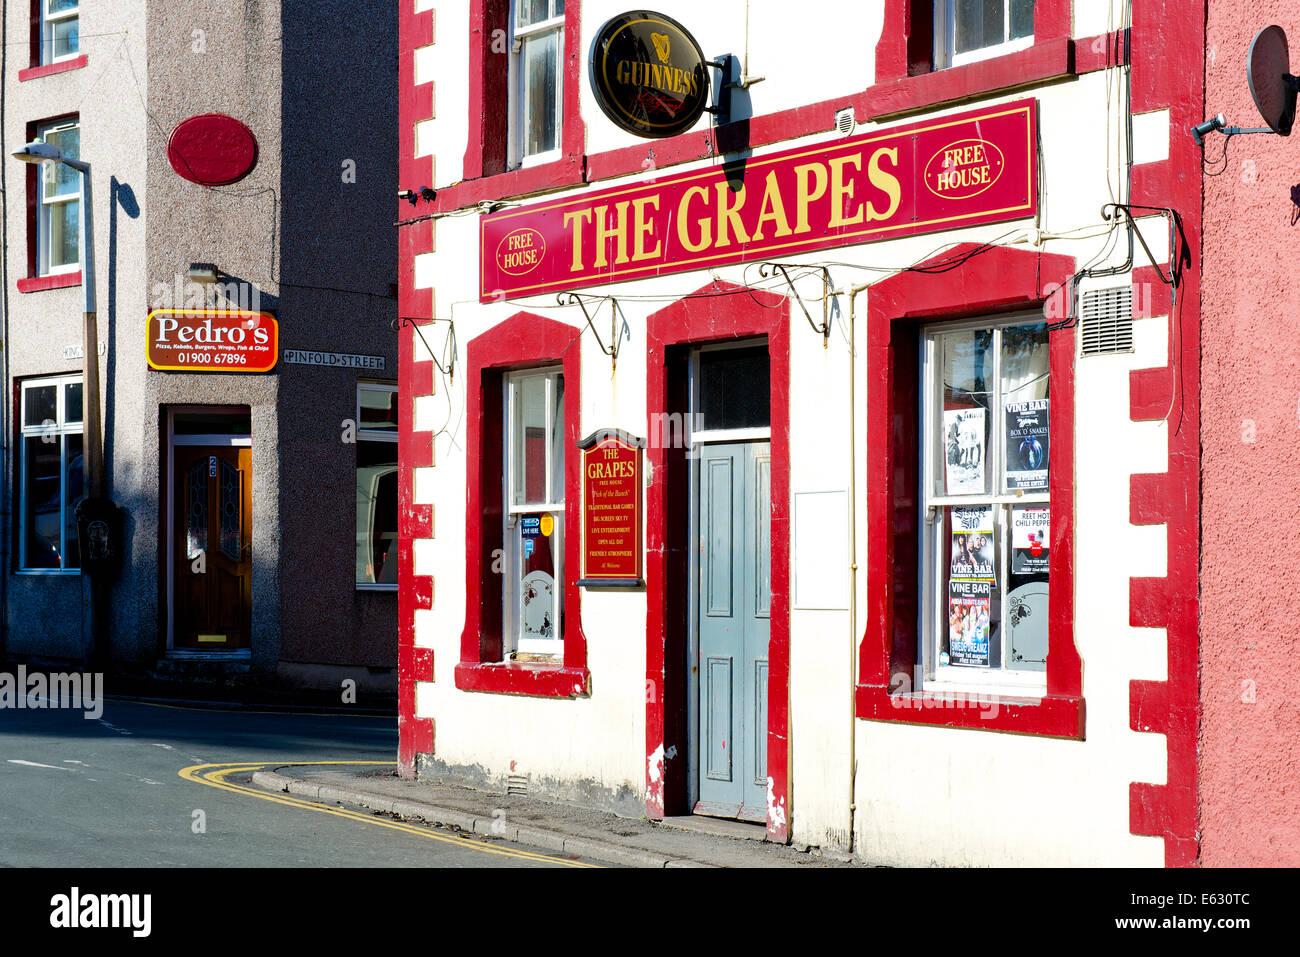 Pub - The Grapes - in Workington, West Cumbria, England UK - Stock Image